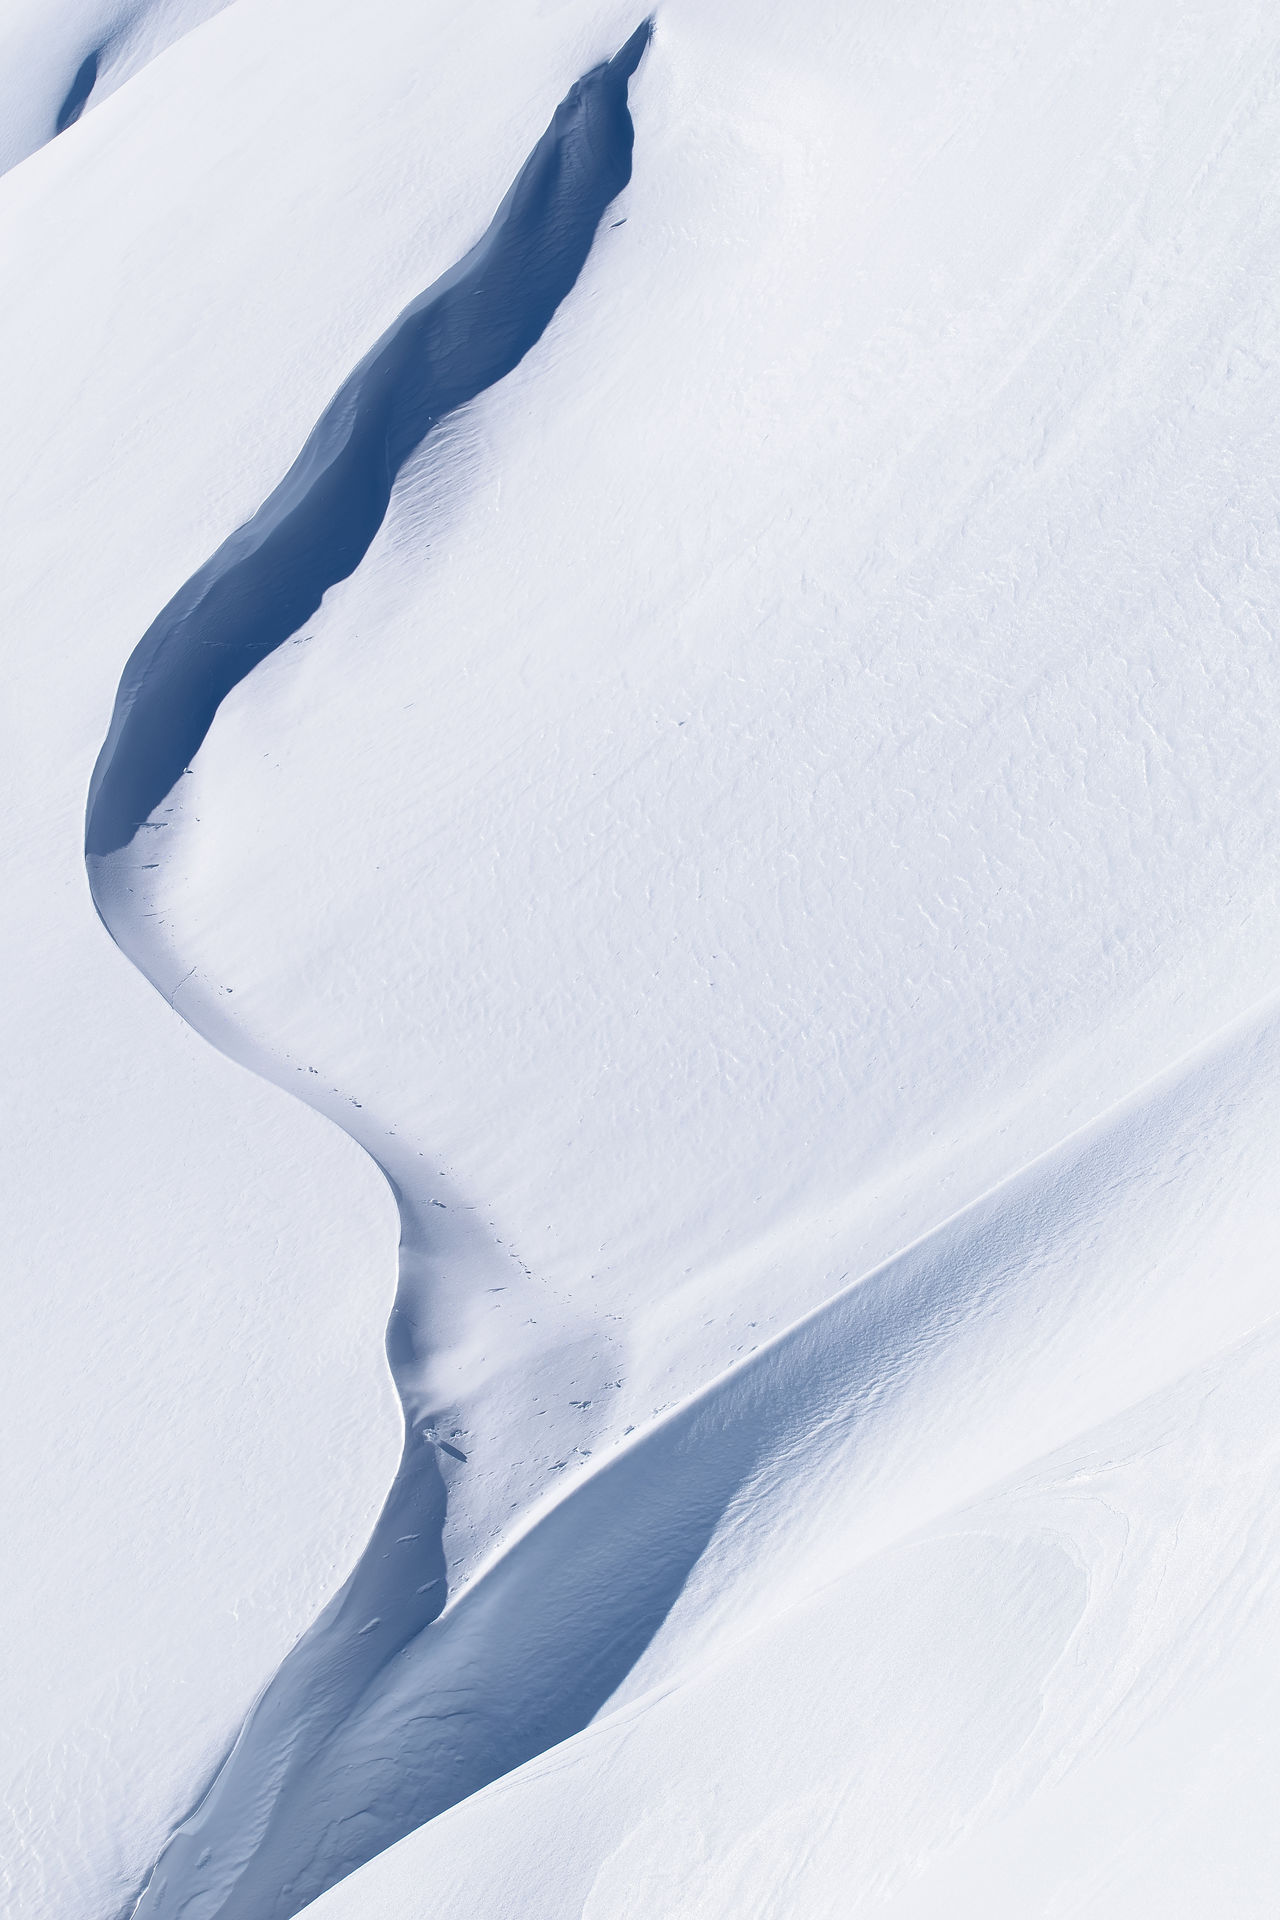 Snow Snow❄⛄ Snowscape Snow Covered Nebelhorn Alpen Alps EyeEm Gallery The Great Outdoors - 2017 EyeEm Awards